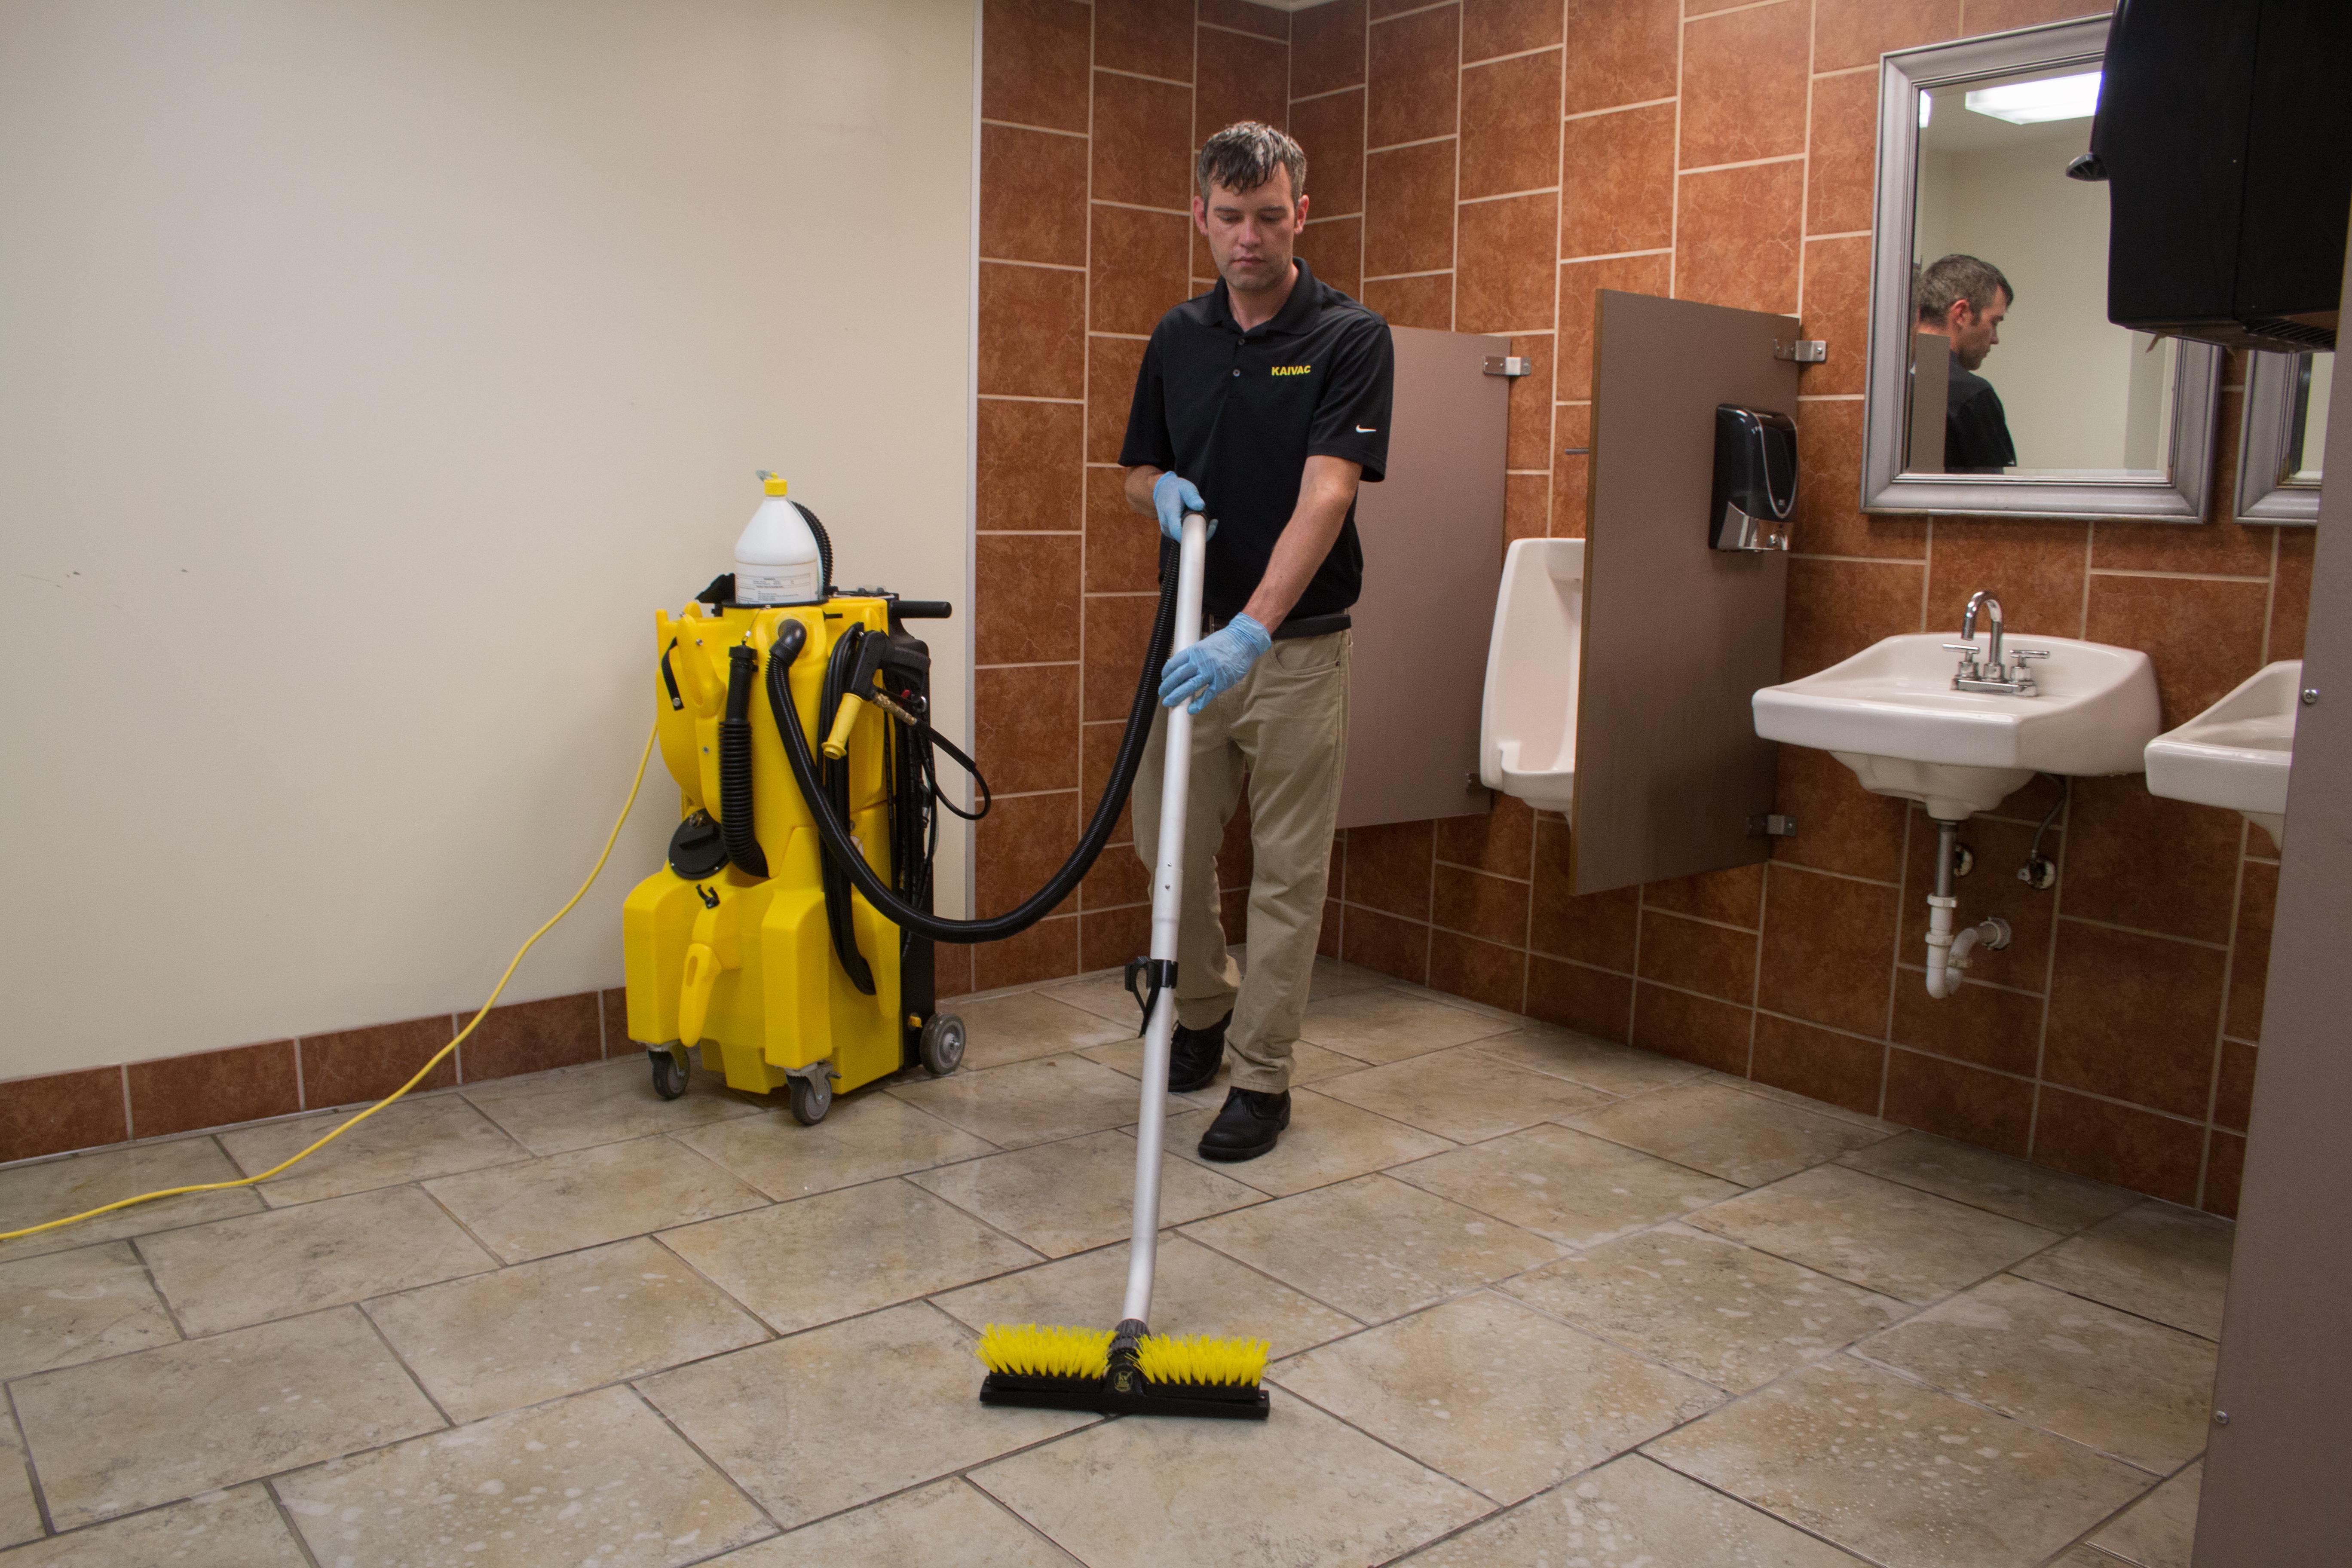 NTC 1250 Restroom Floor Cleaning